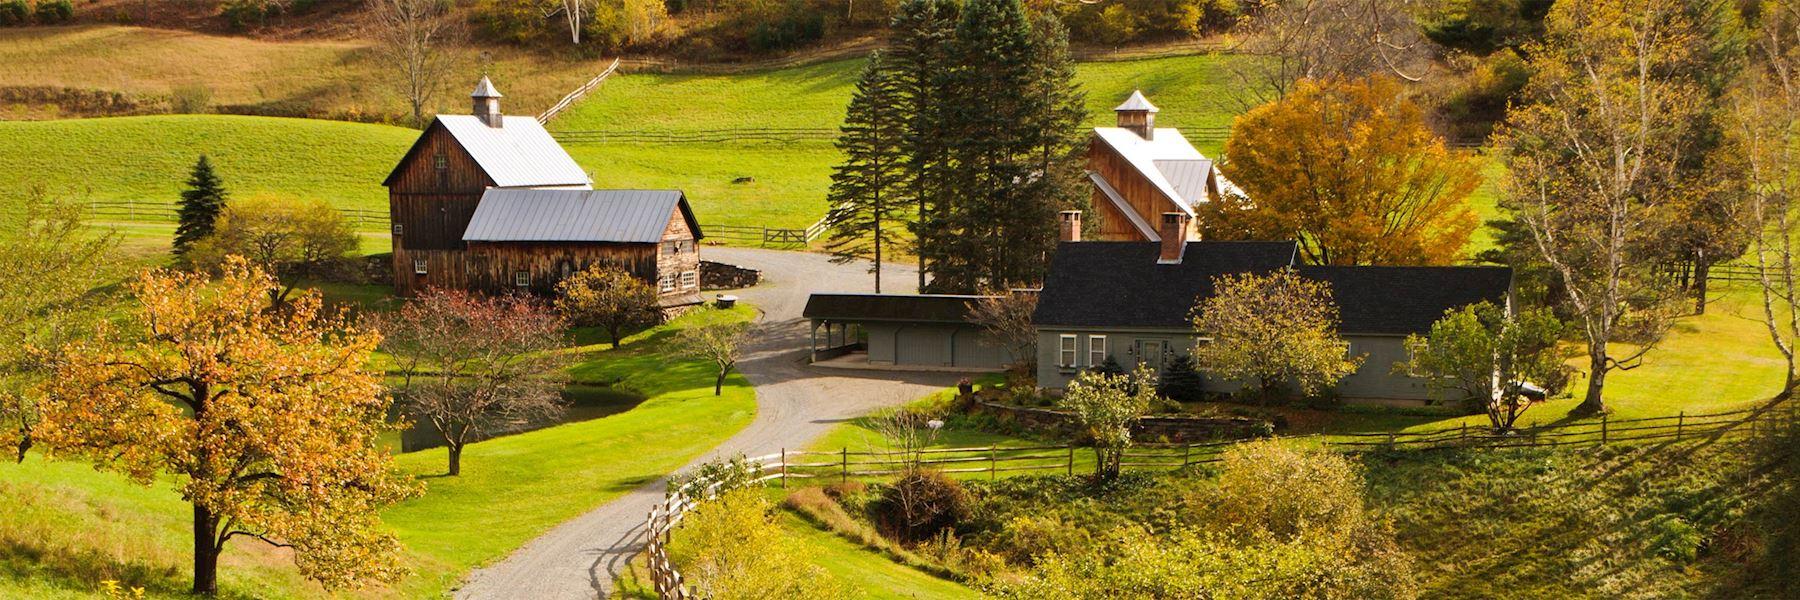 Visit Woodstock, New England